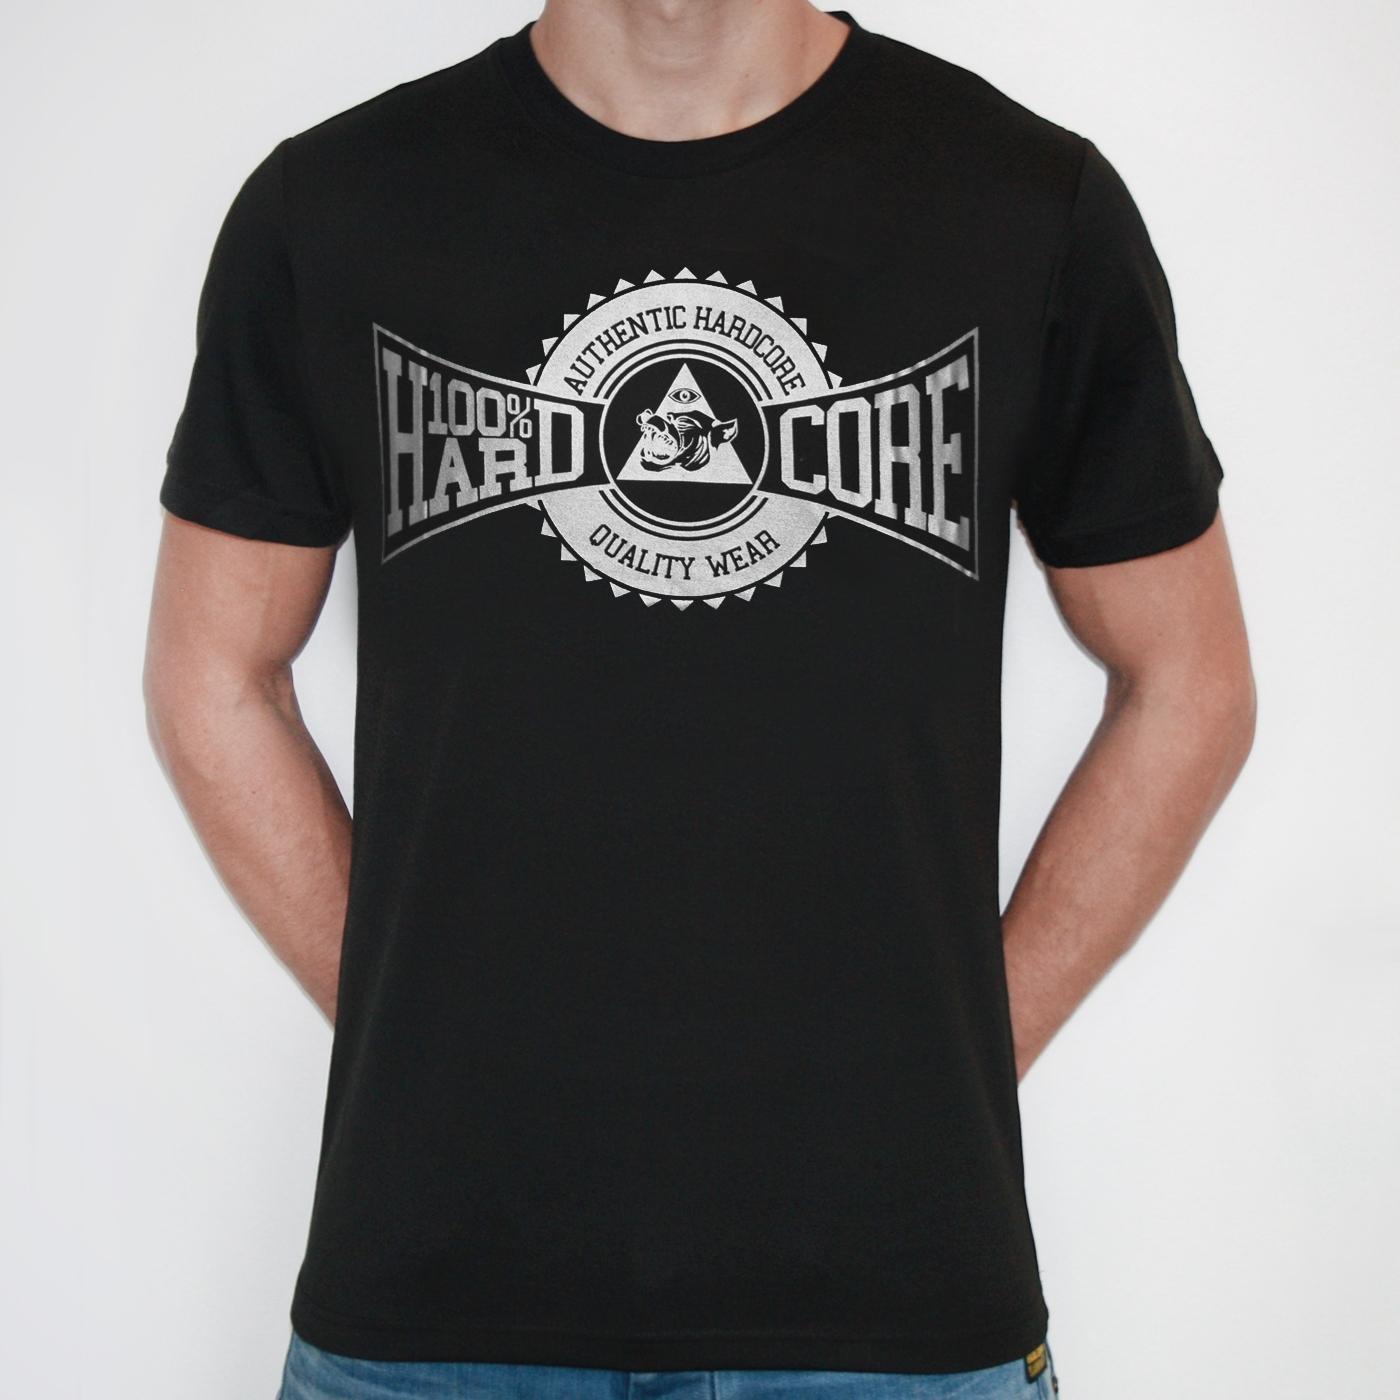 100% Hardcore authentic hardcore quality wear t-shirt ...